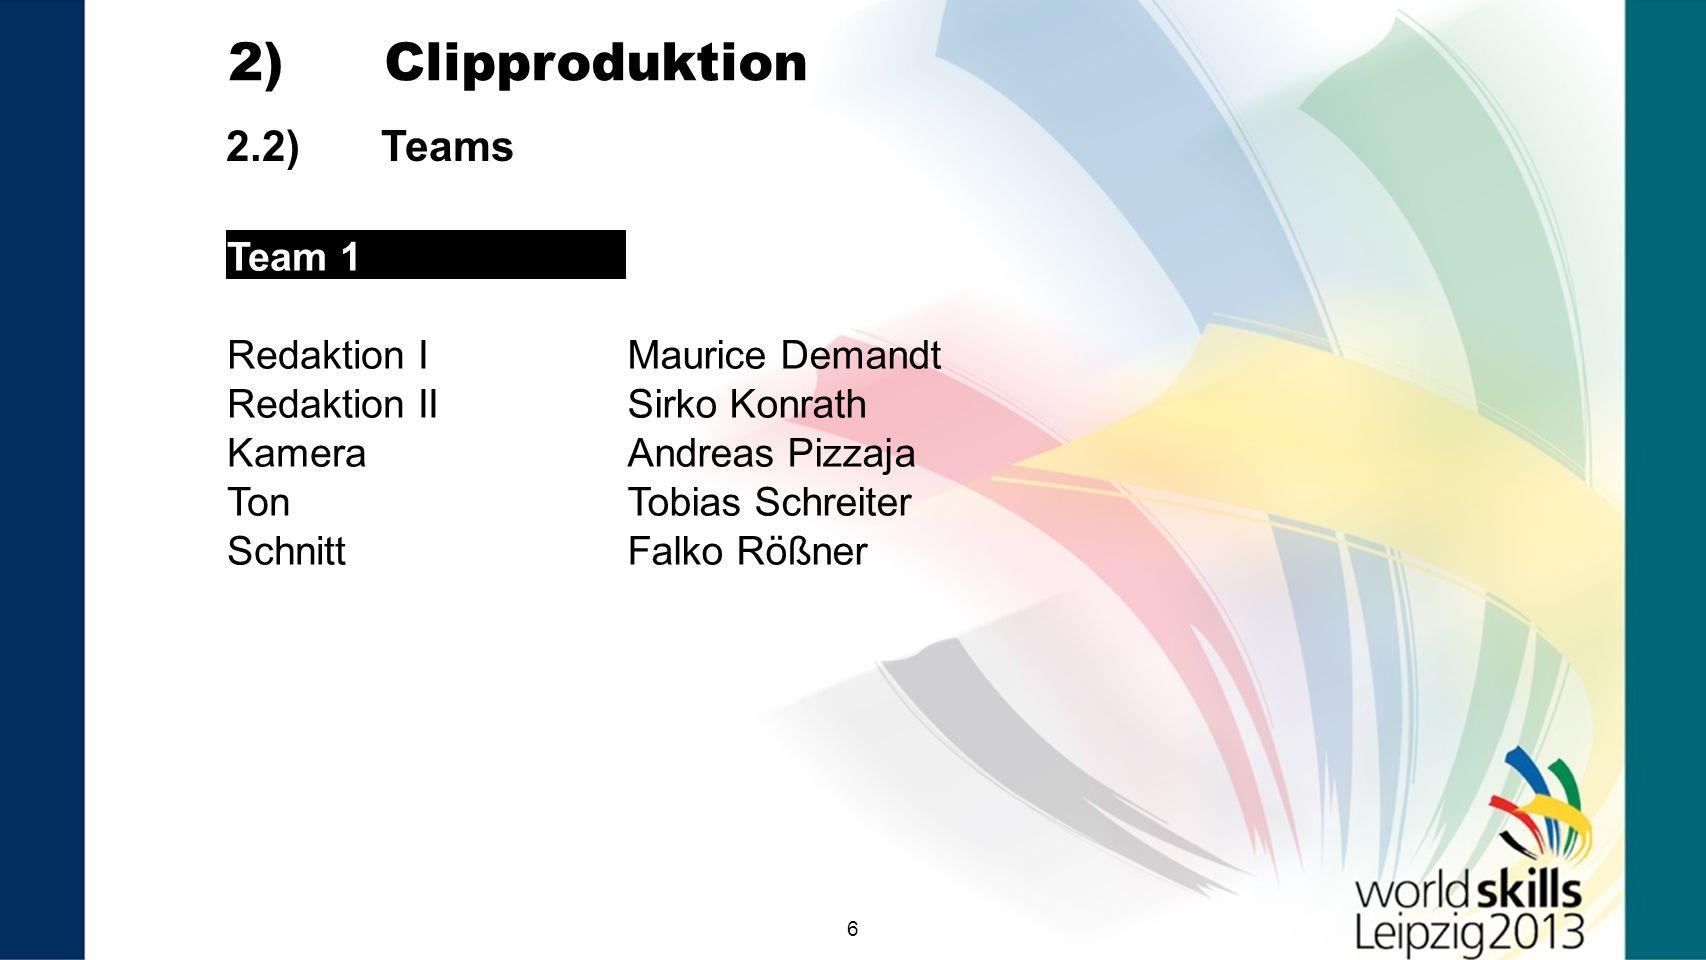 66 2.2) Teams 2) Clipproduktion Team 1 Redaktion IMaurice Demandt Redaktion IISirko Konrath KameraAndreas Pizzaja TonTobias Schreiter SchnittFalko Rößner